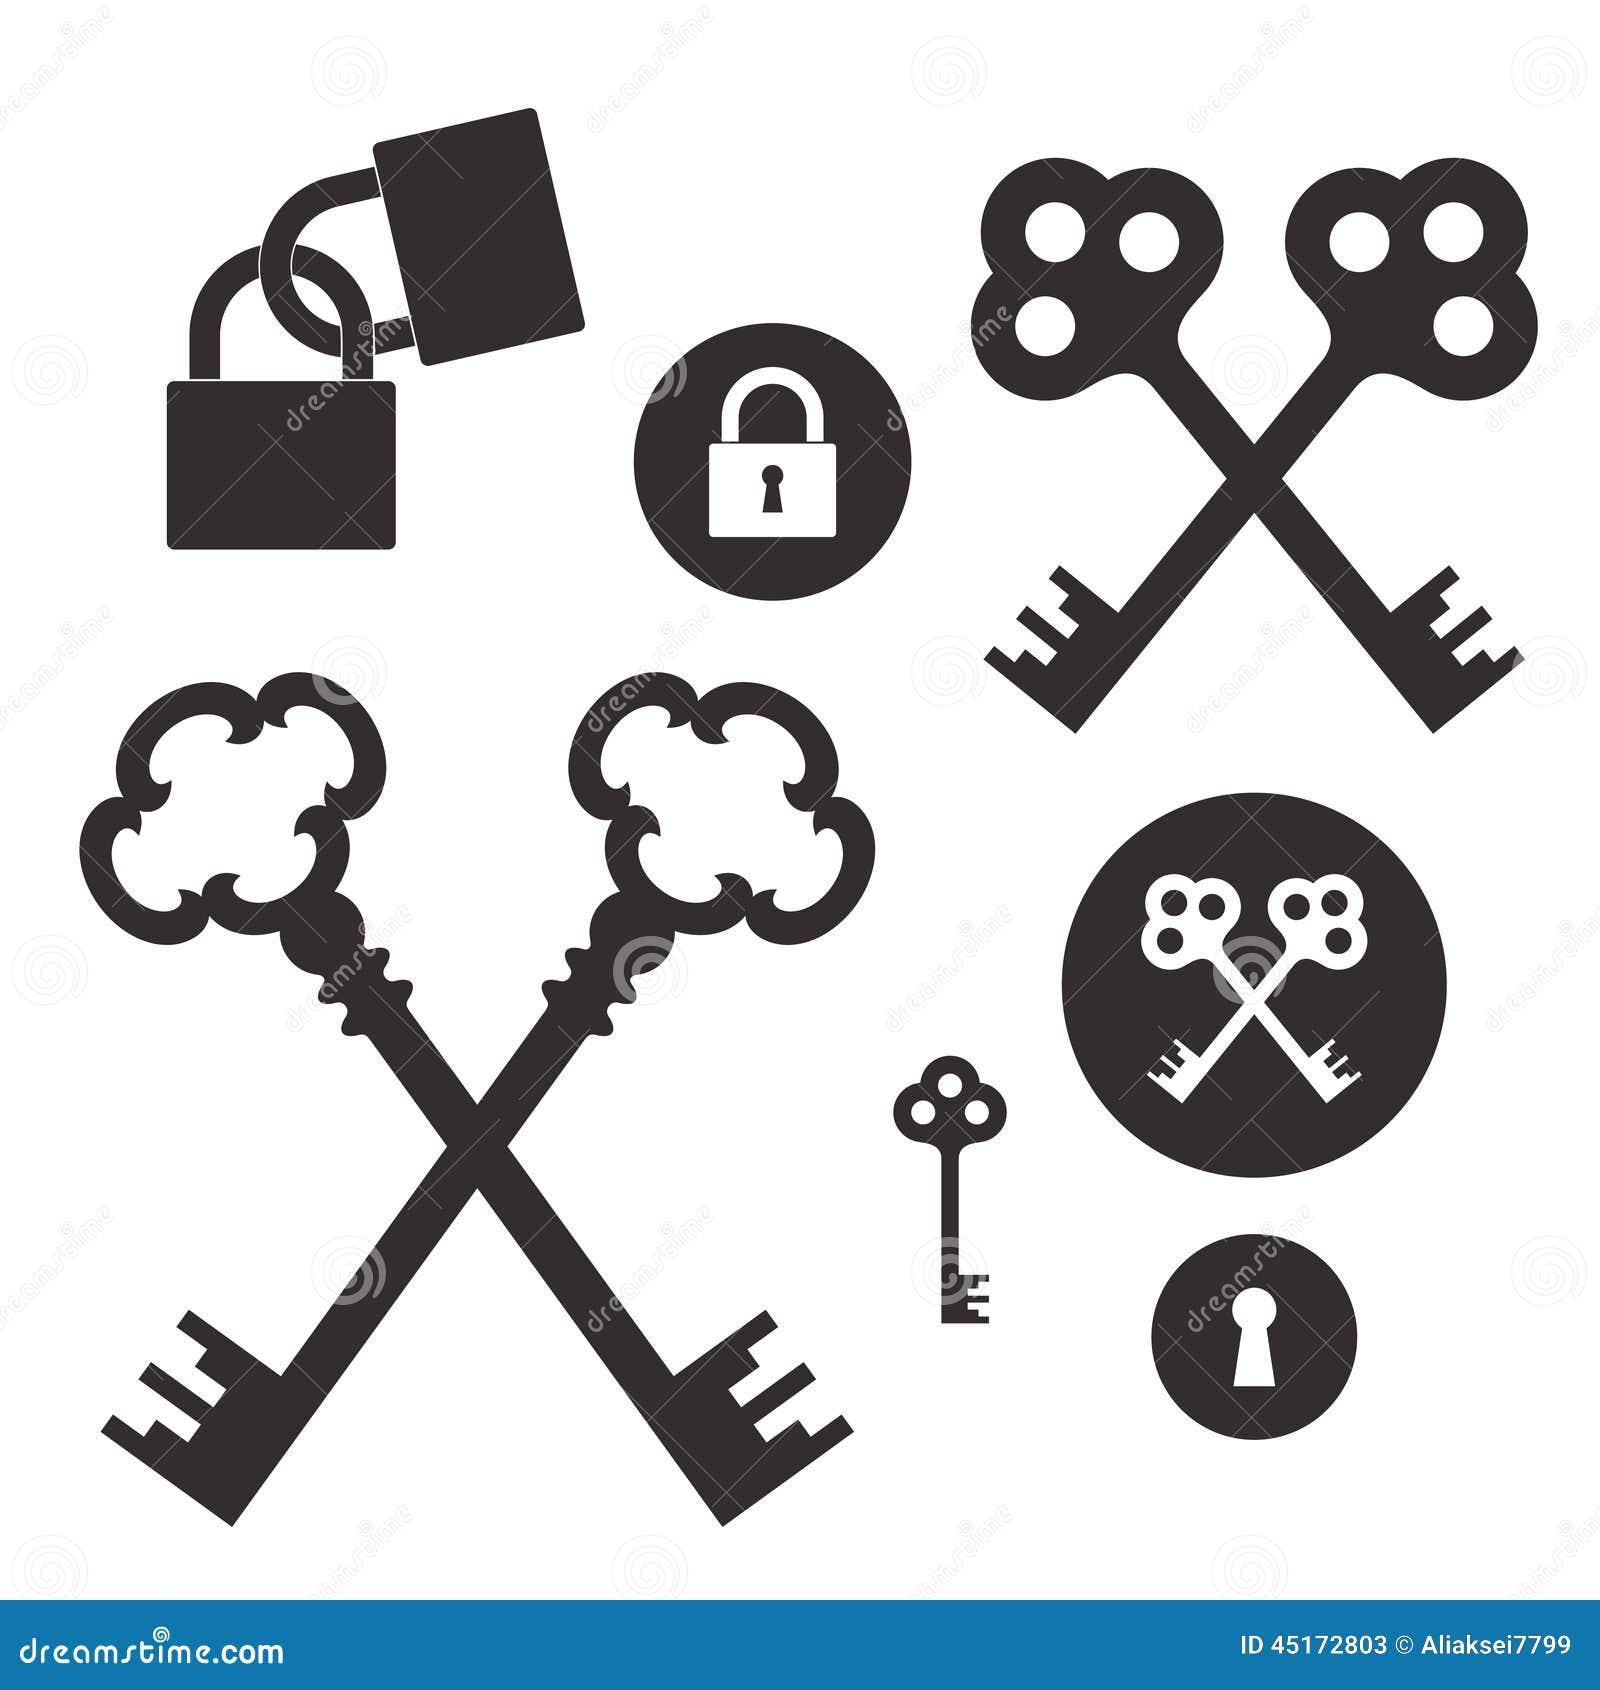 Vector Key Illustration: Key. Lock. Icon Set Stock Vector. Image Of Vector, Lock